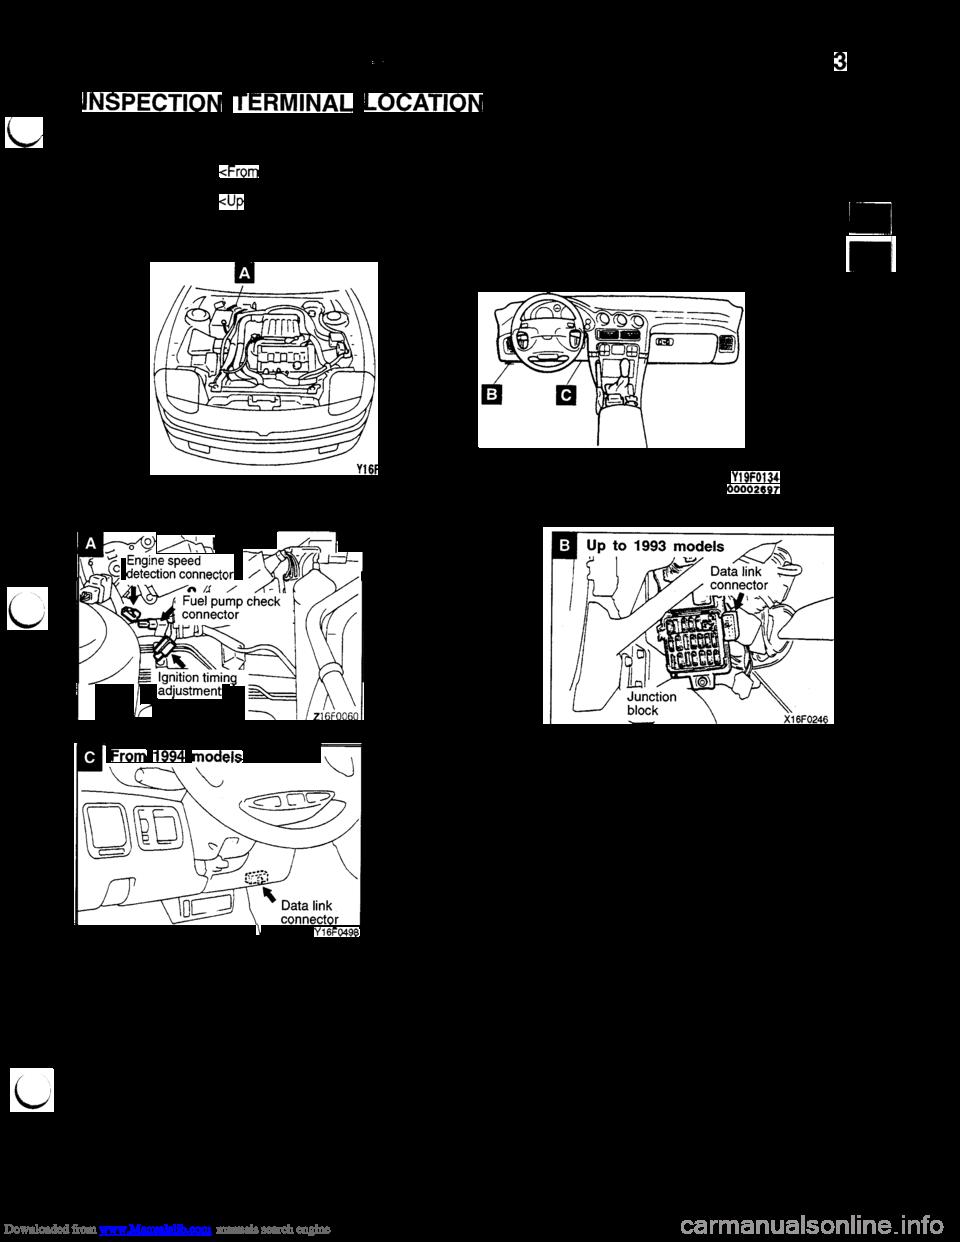 Mitsubishi 3000gt 1994 2g Workshop Manual Transmission Diagram 1993